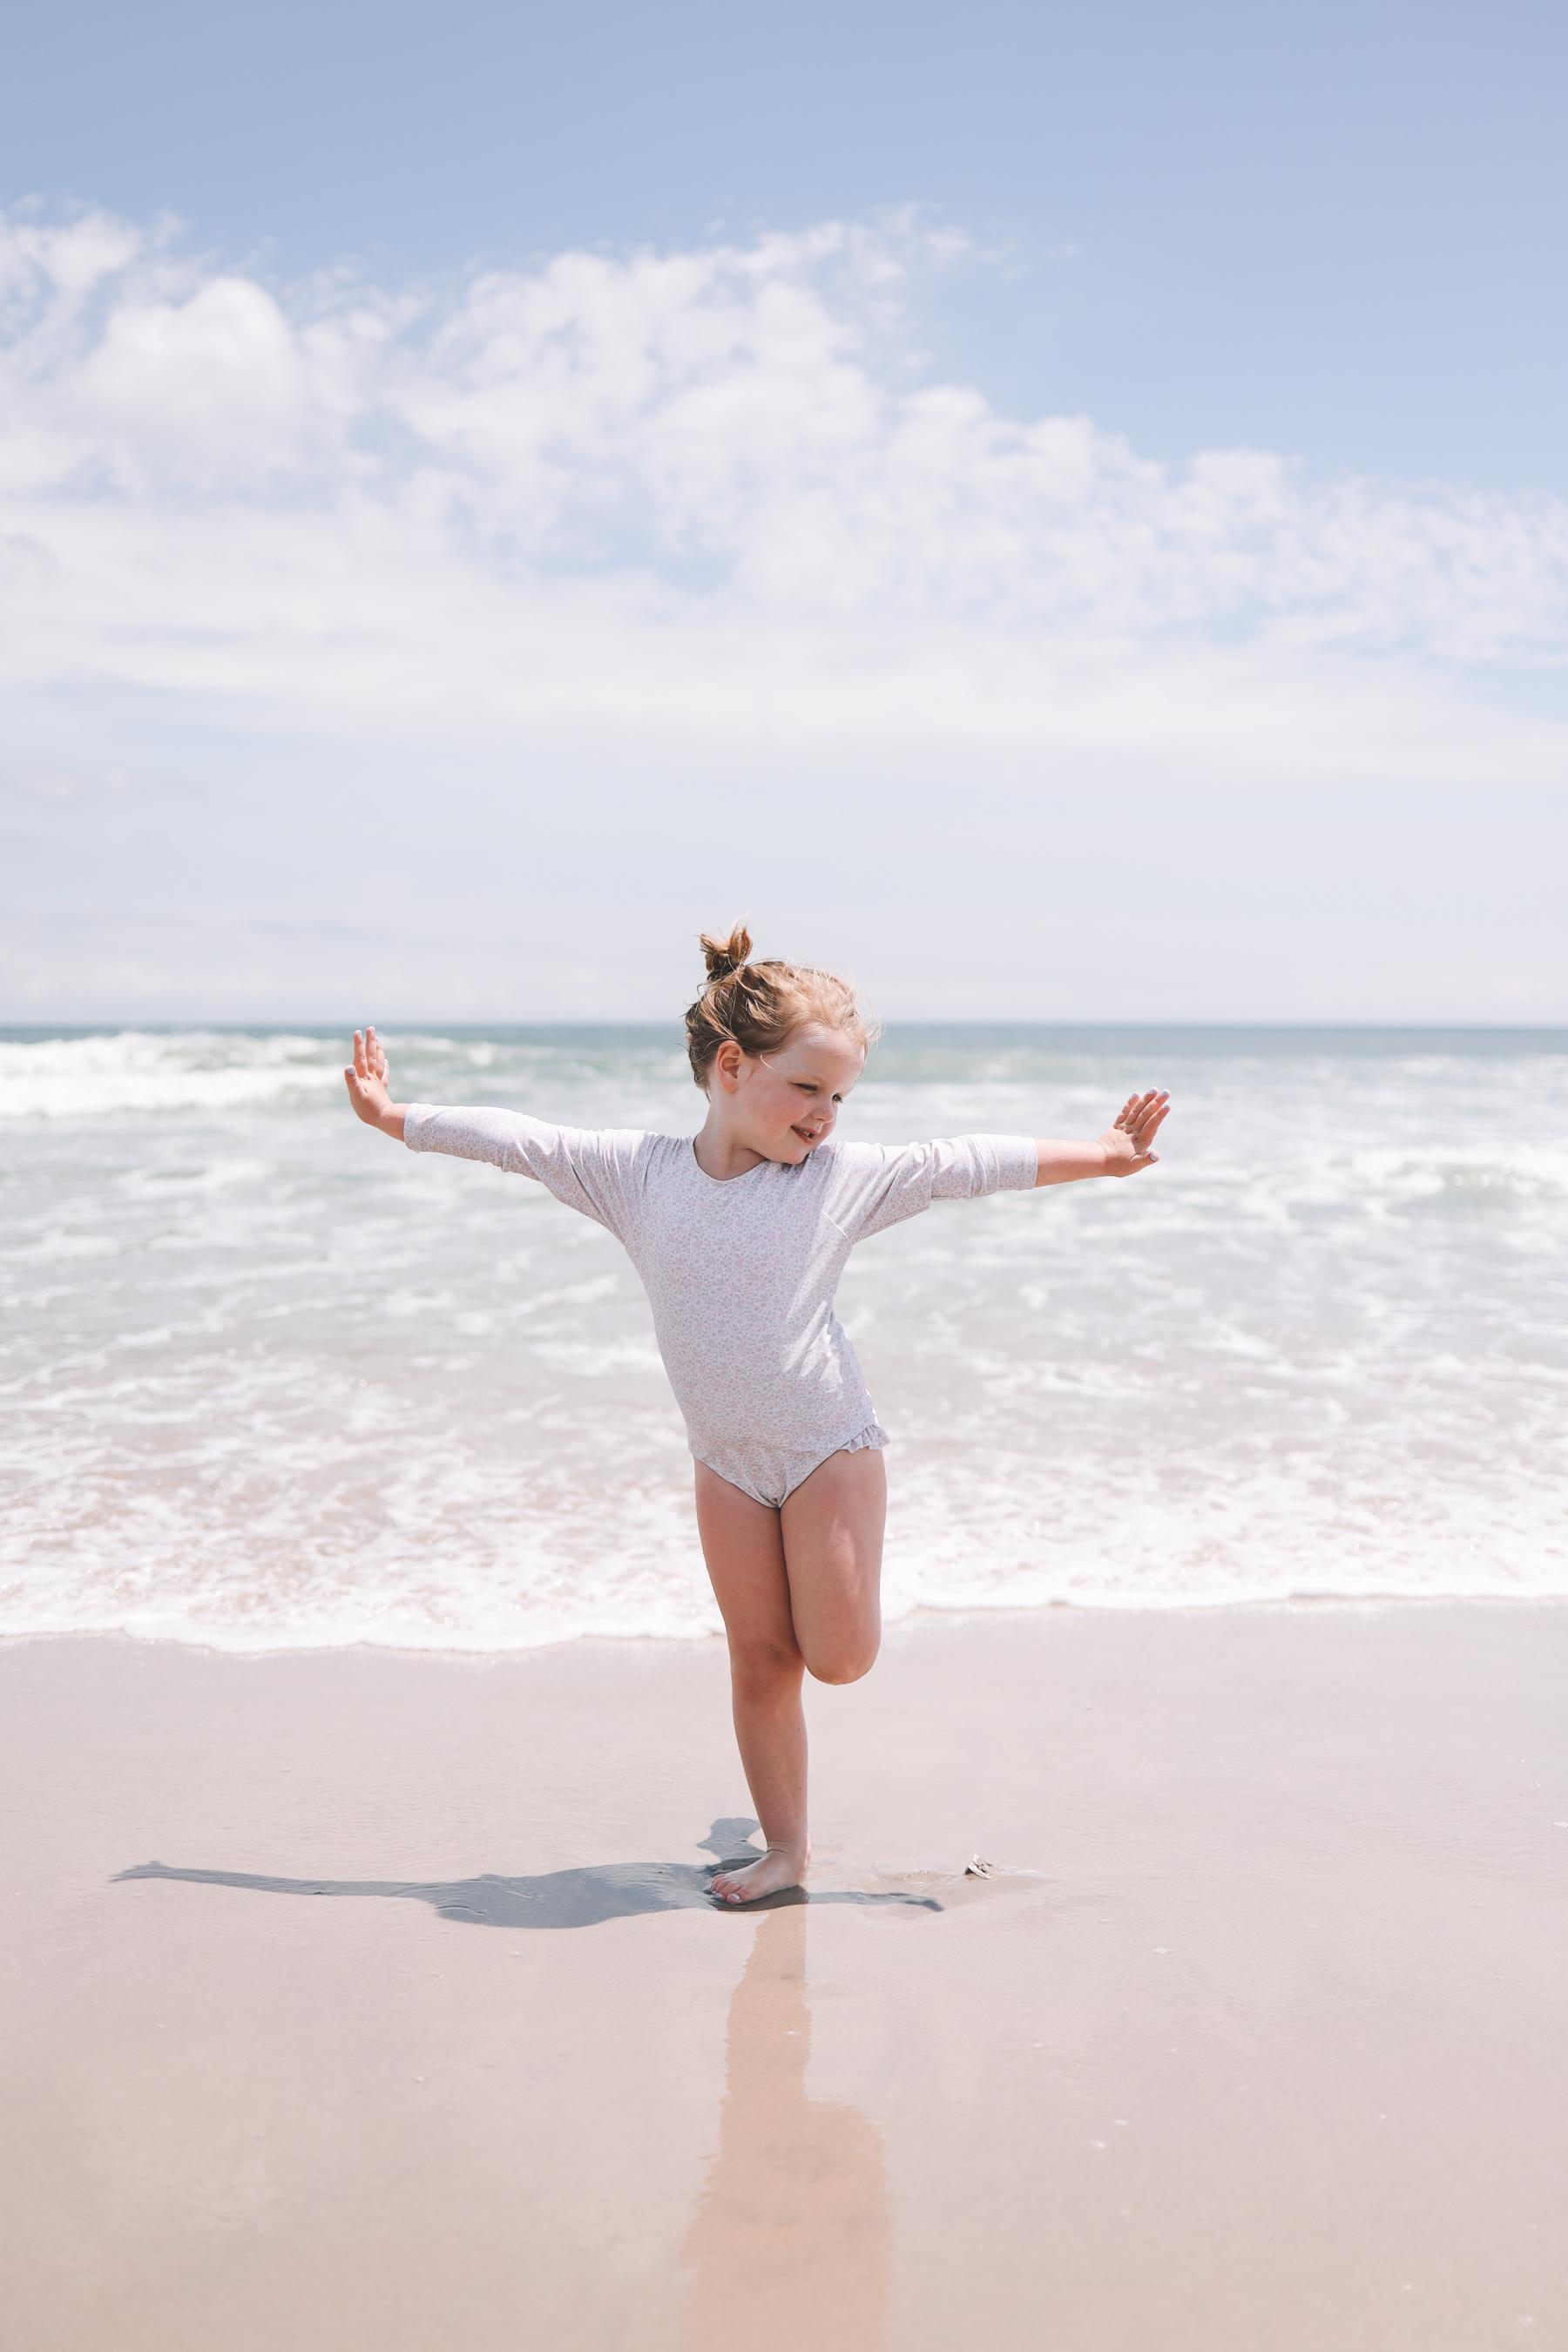 Emma Ocean City Beach Days